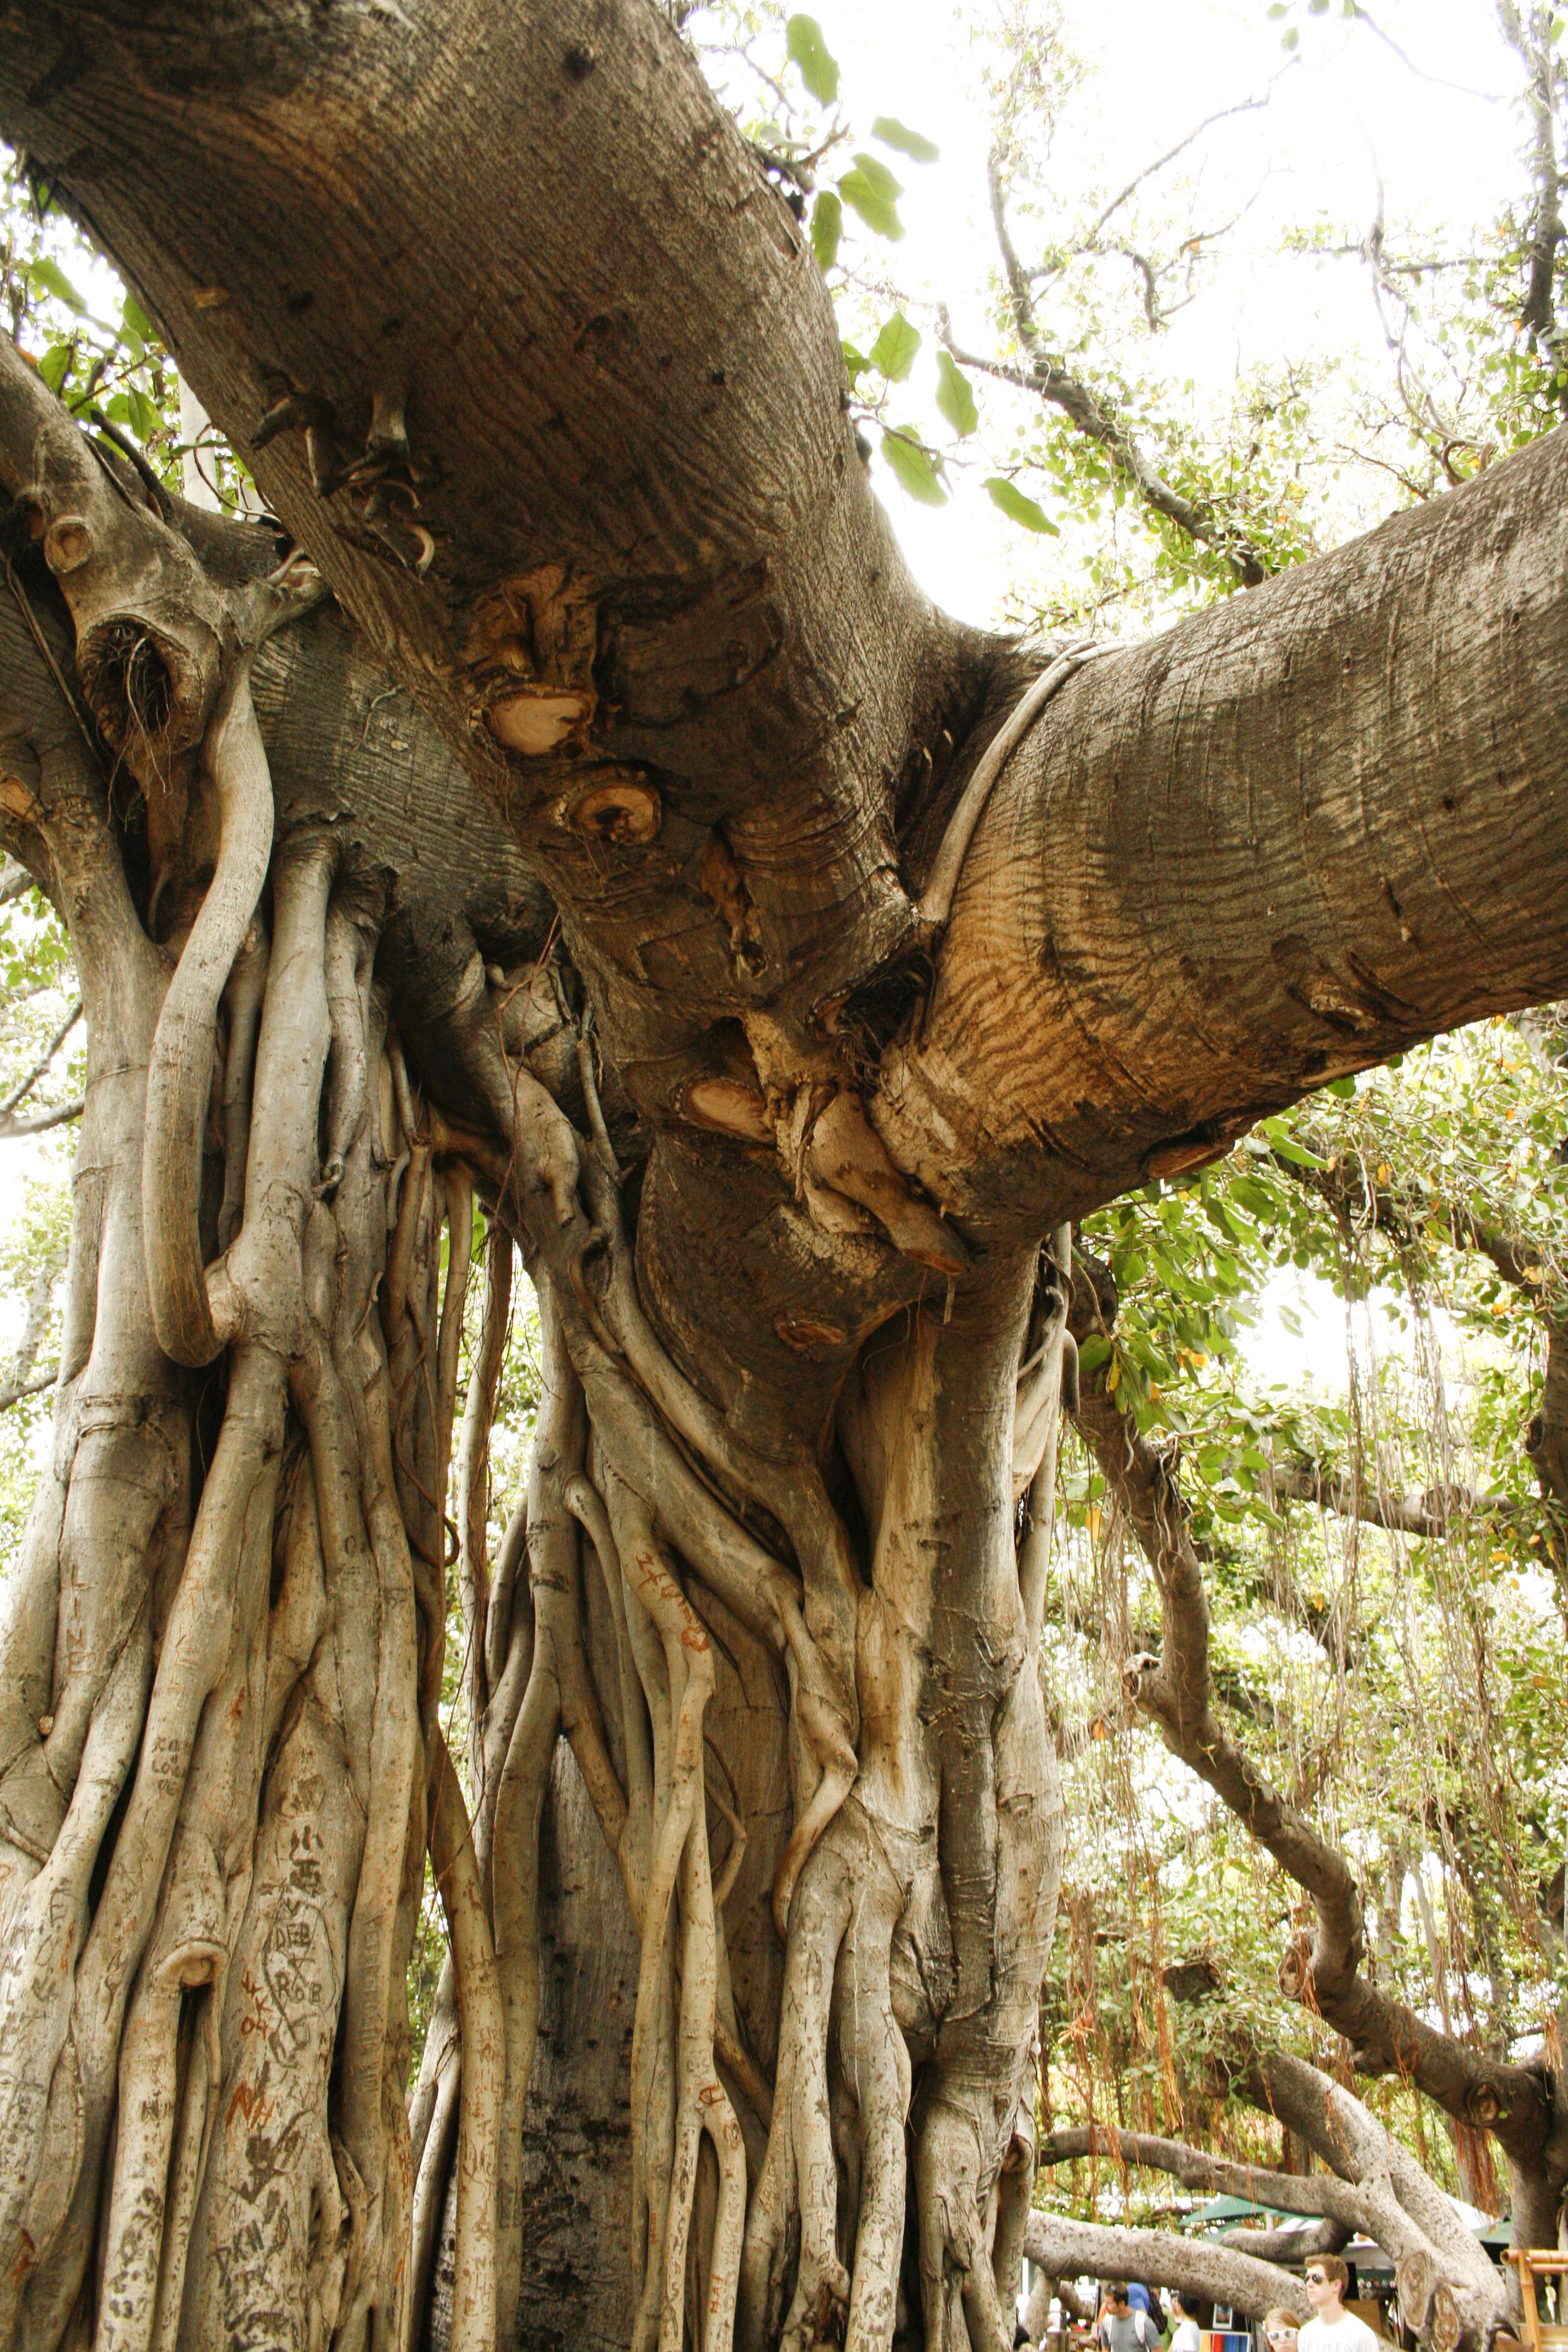 Banyan tree branch and root.